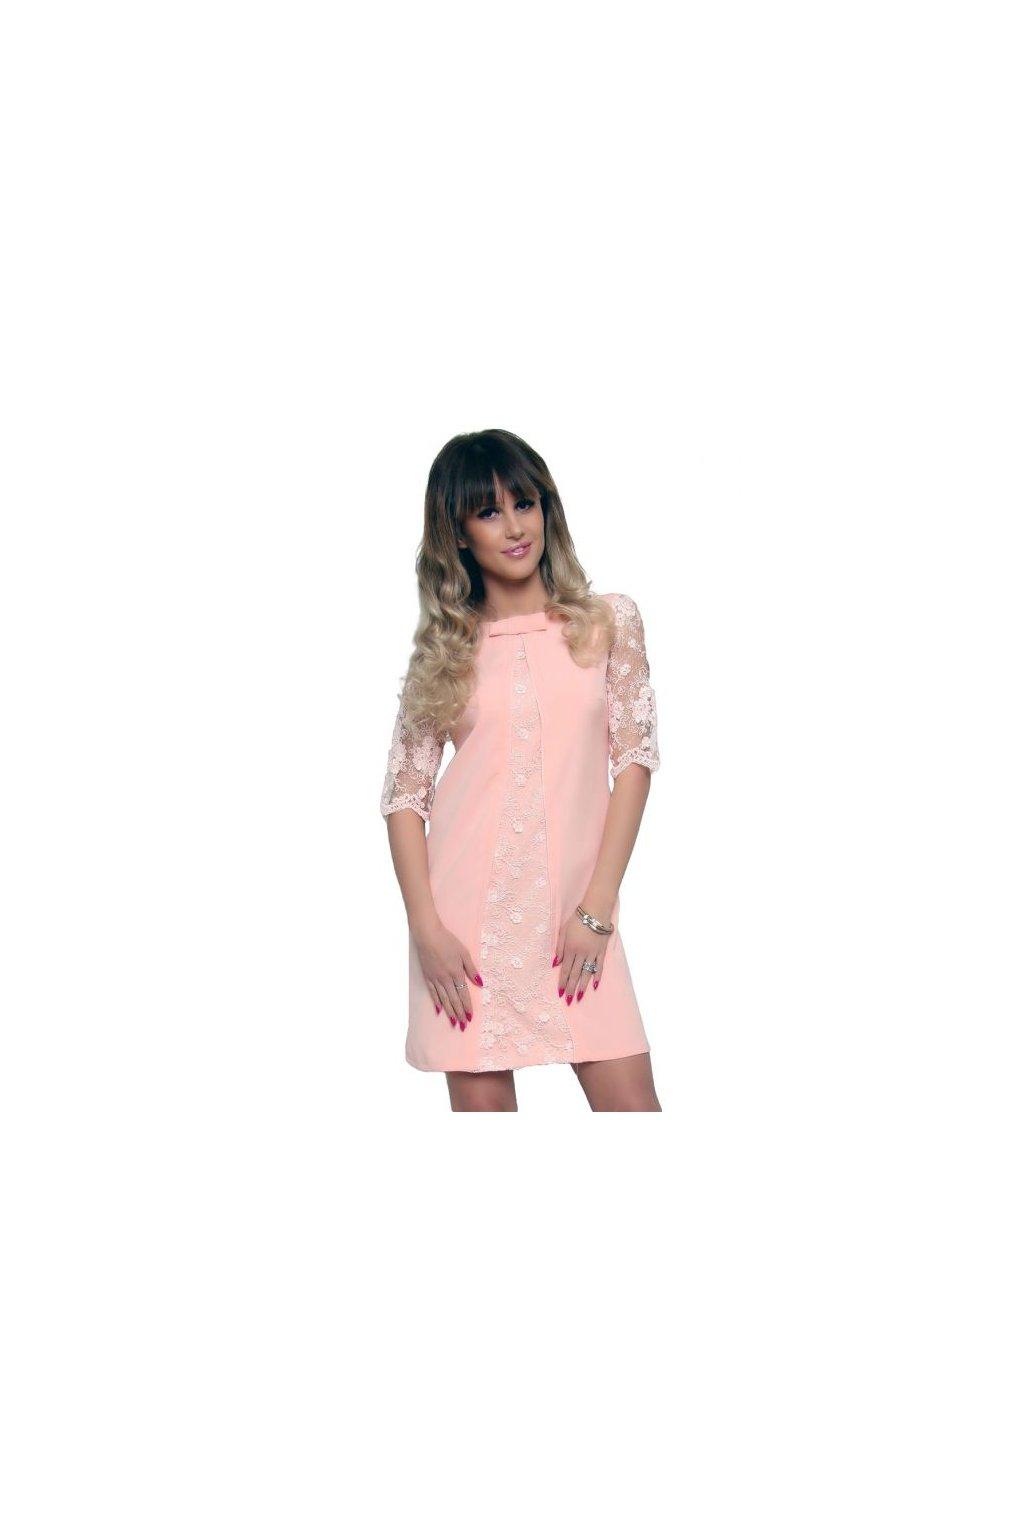 Koktejlové šaty s čipkou CM452 ružové - Tentation.sk 54cc88294e